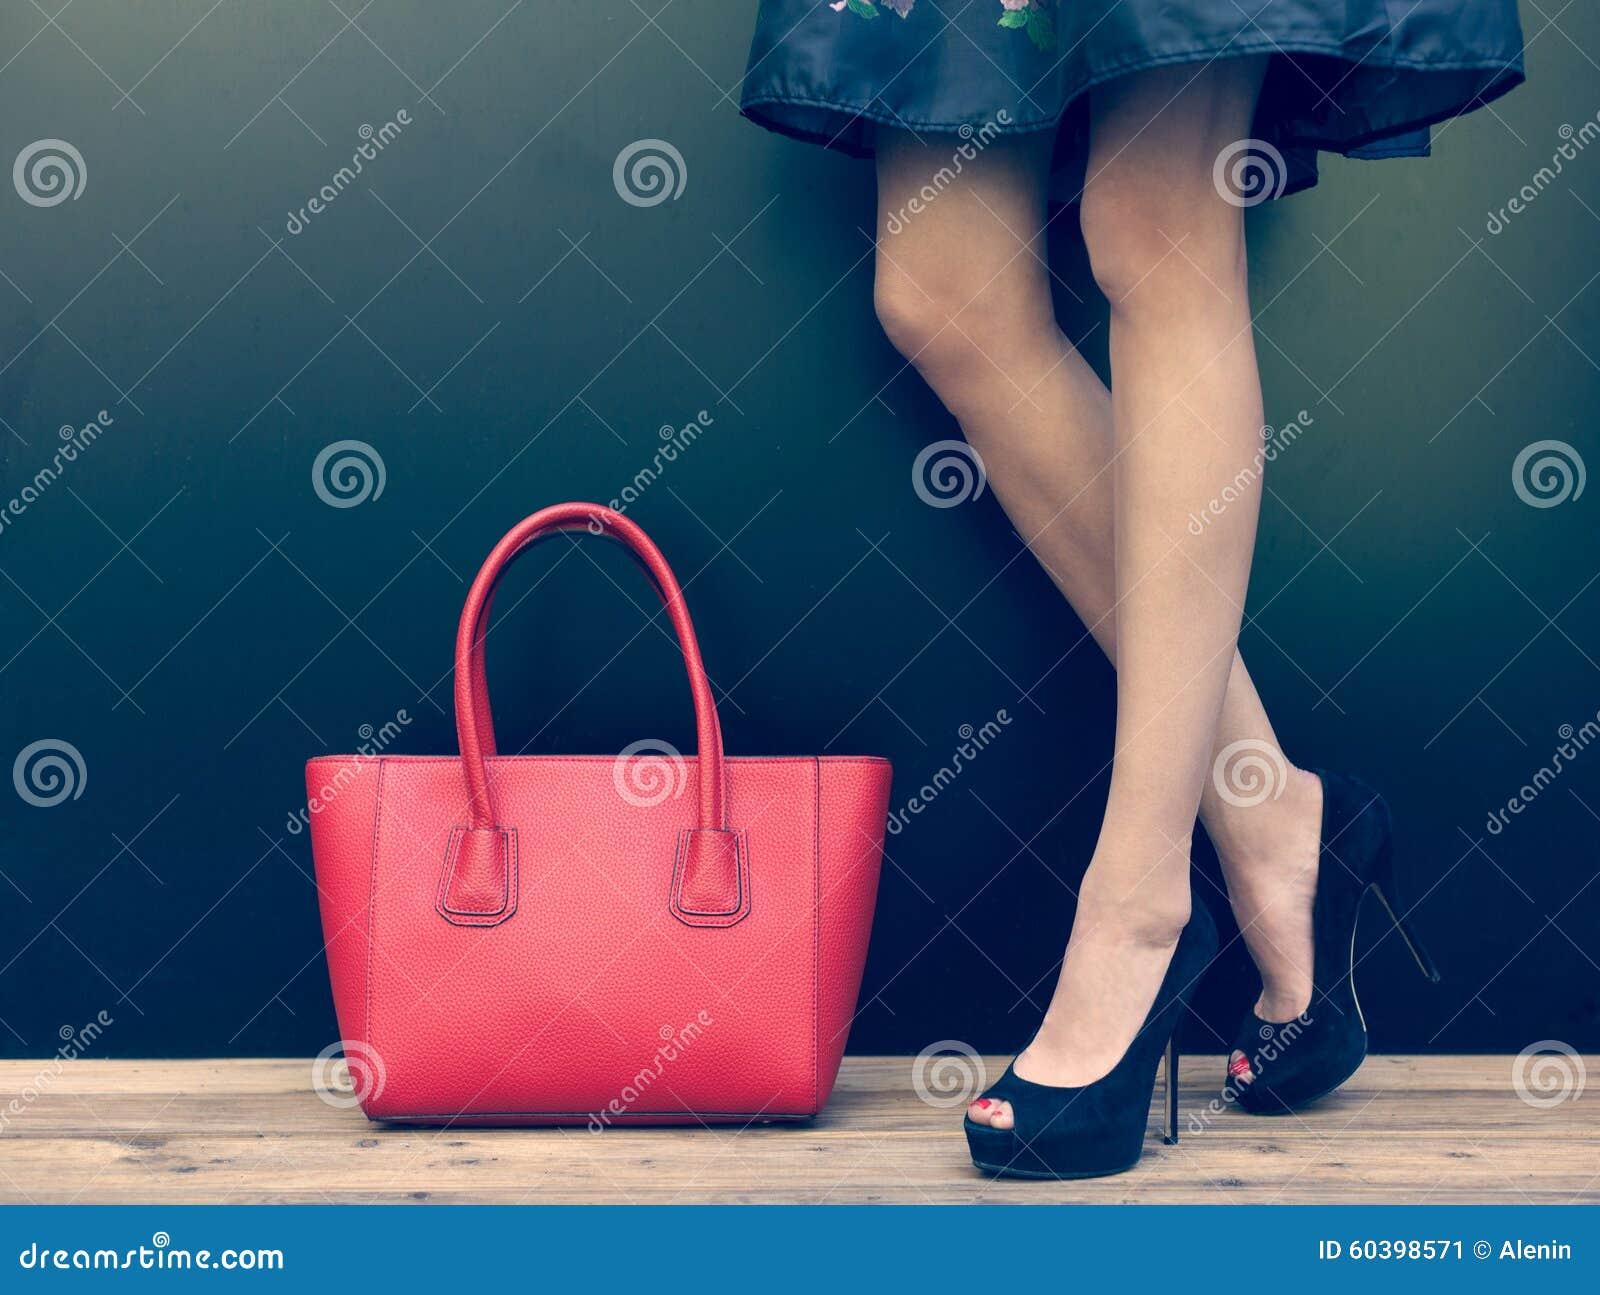 7a28fdd0668 Fashion leggy girl in a beautiful high-heeled shoes in short denim dress  summer posing near the dark wall. Close-up.